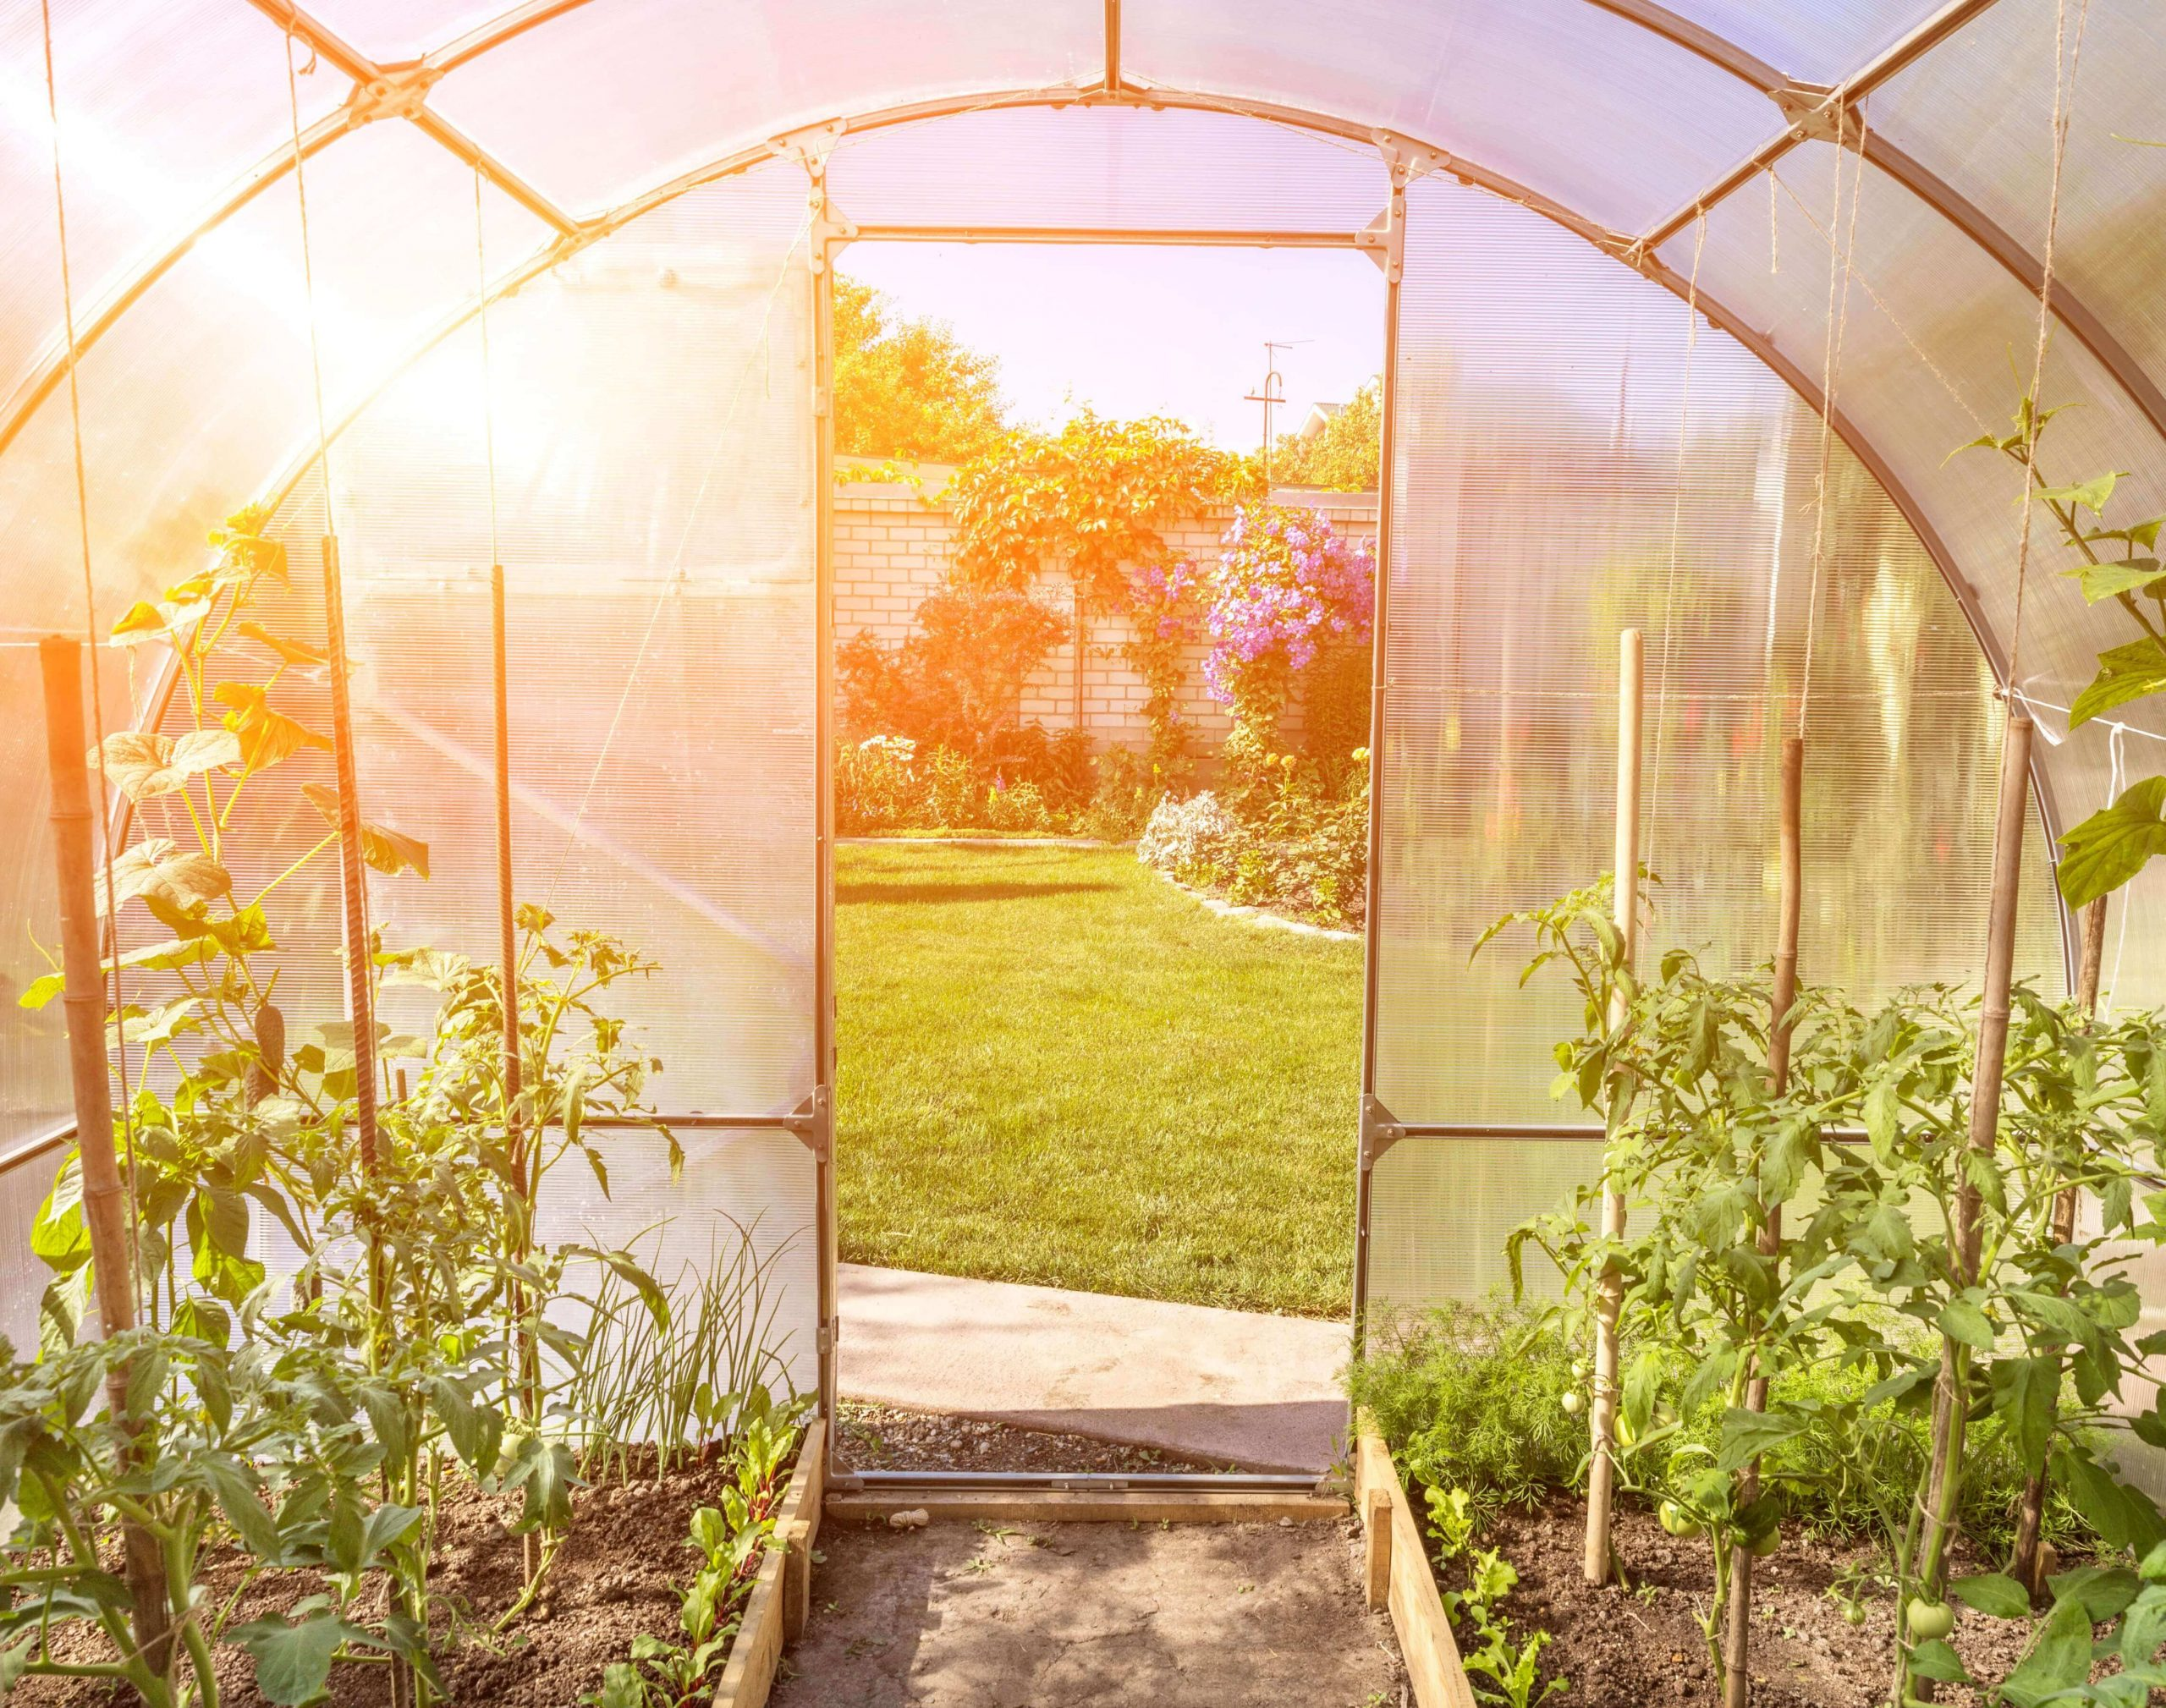 Fabriquer Soi-Même Sa Serre De Jardin - Salon Viving concernant Fabriquer Une Serre De Jardin